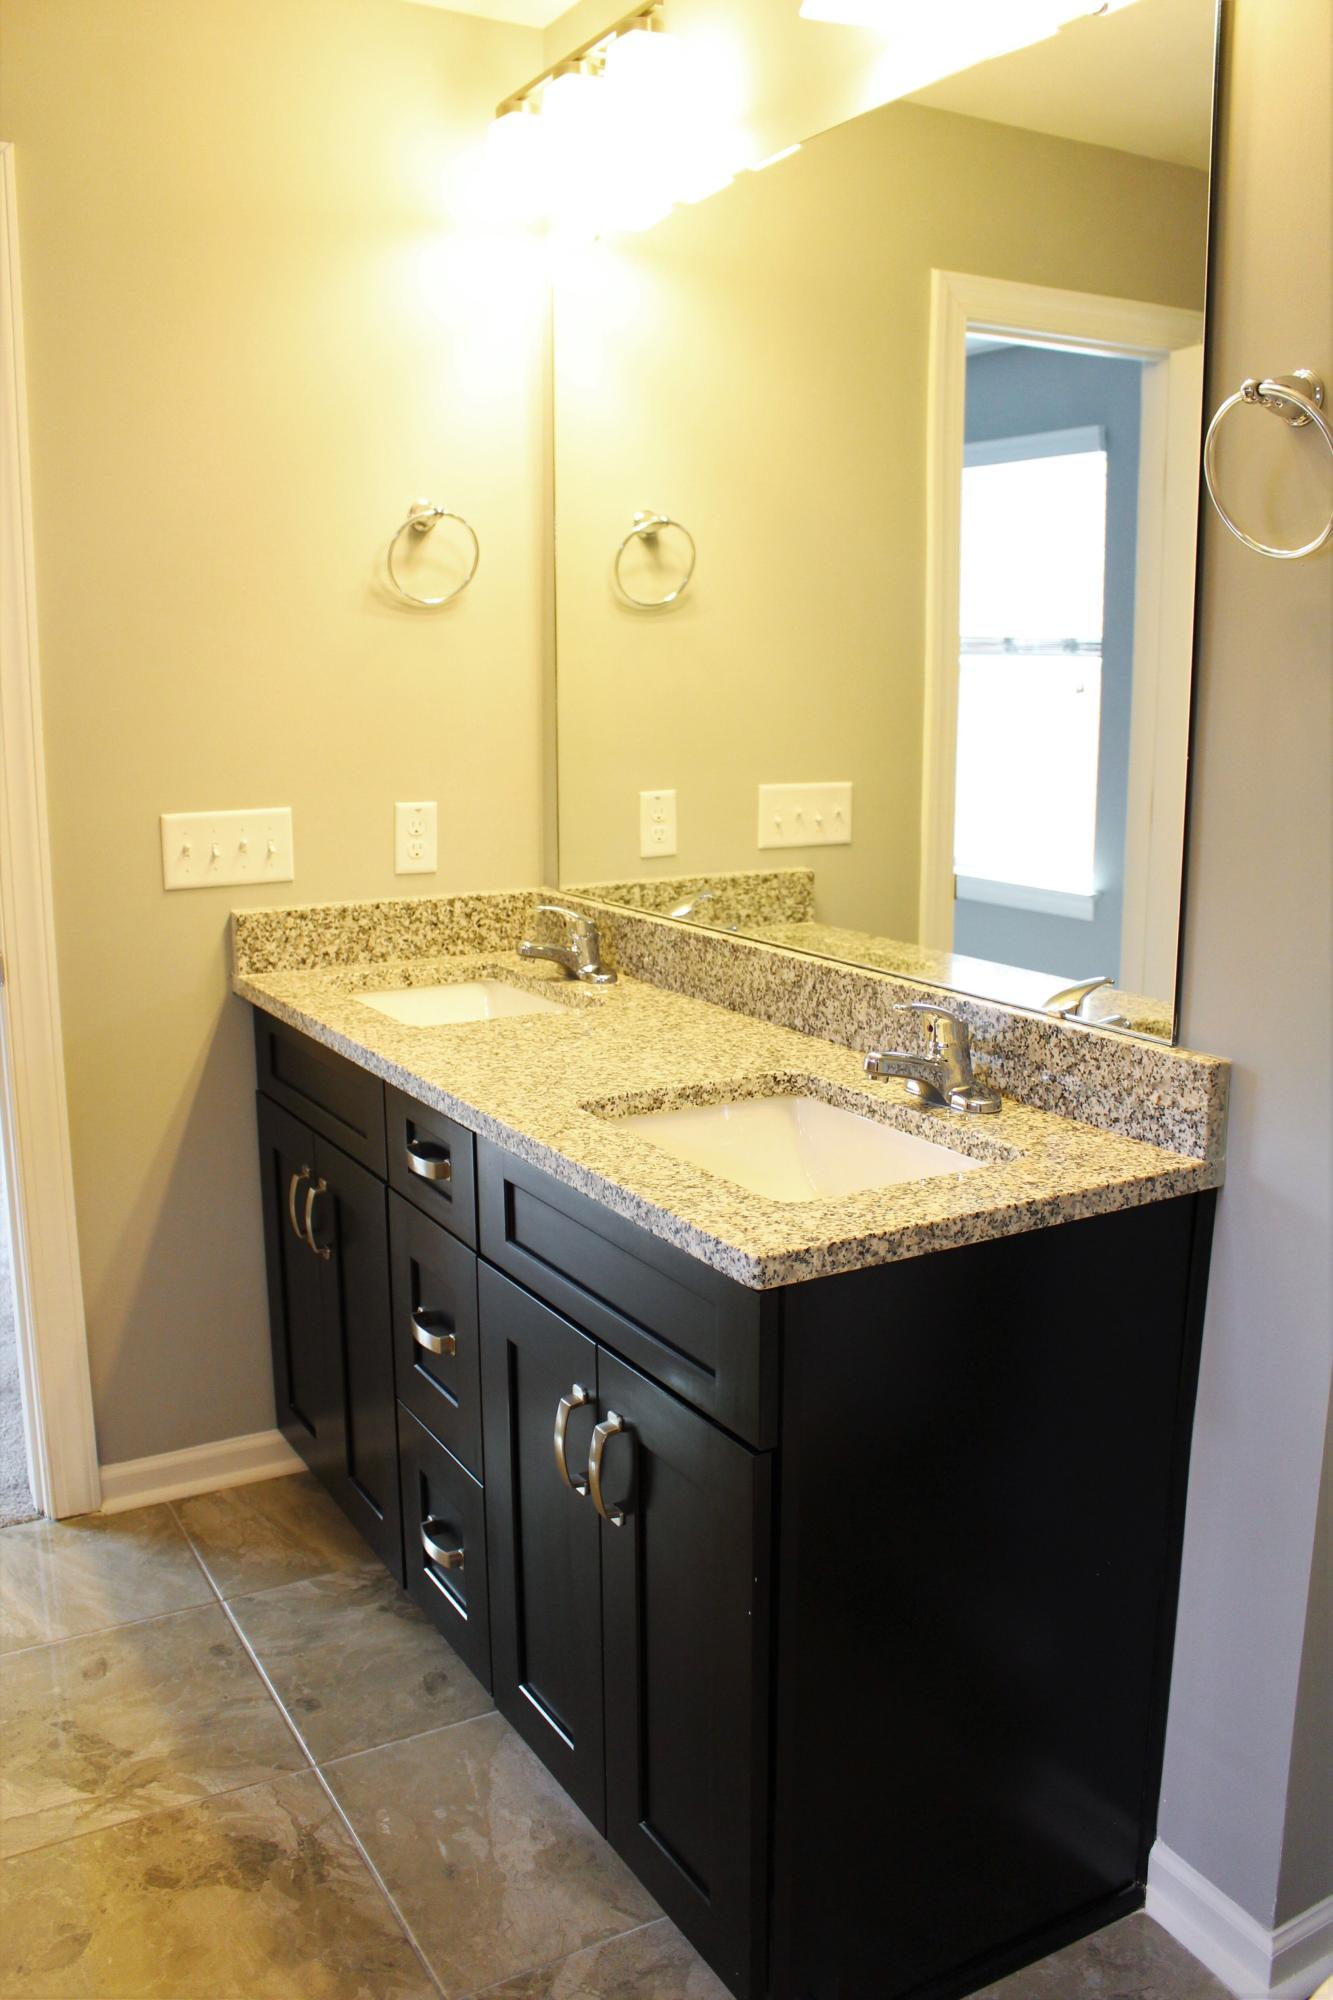 Filbin Creek Homes For Sale - 1173 Sumner, North Charleston, SC - 3